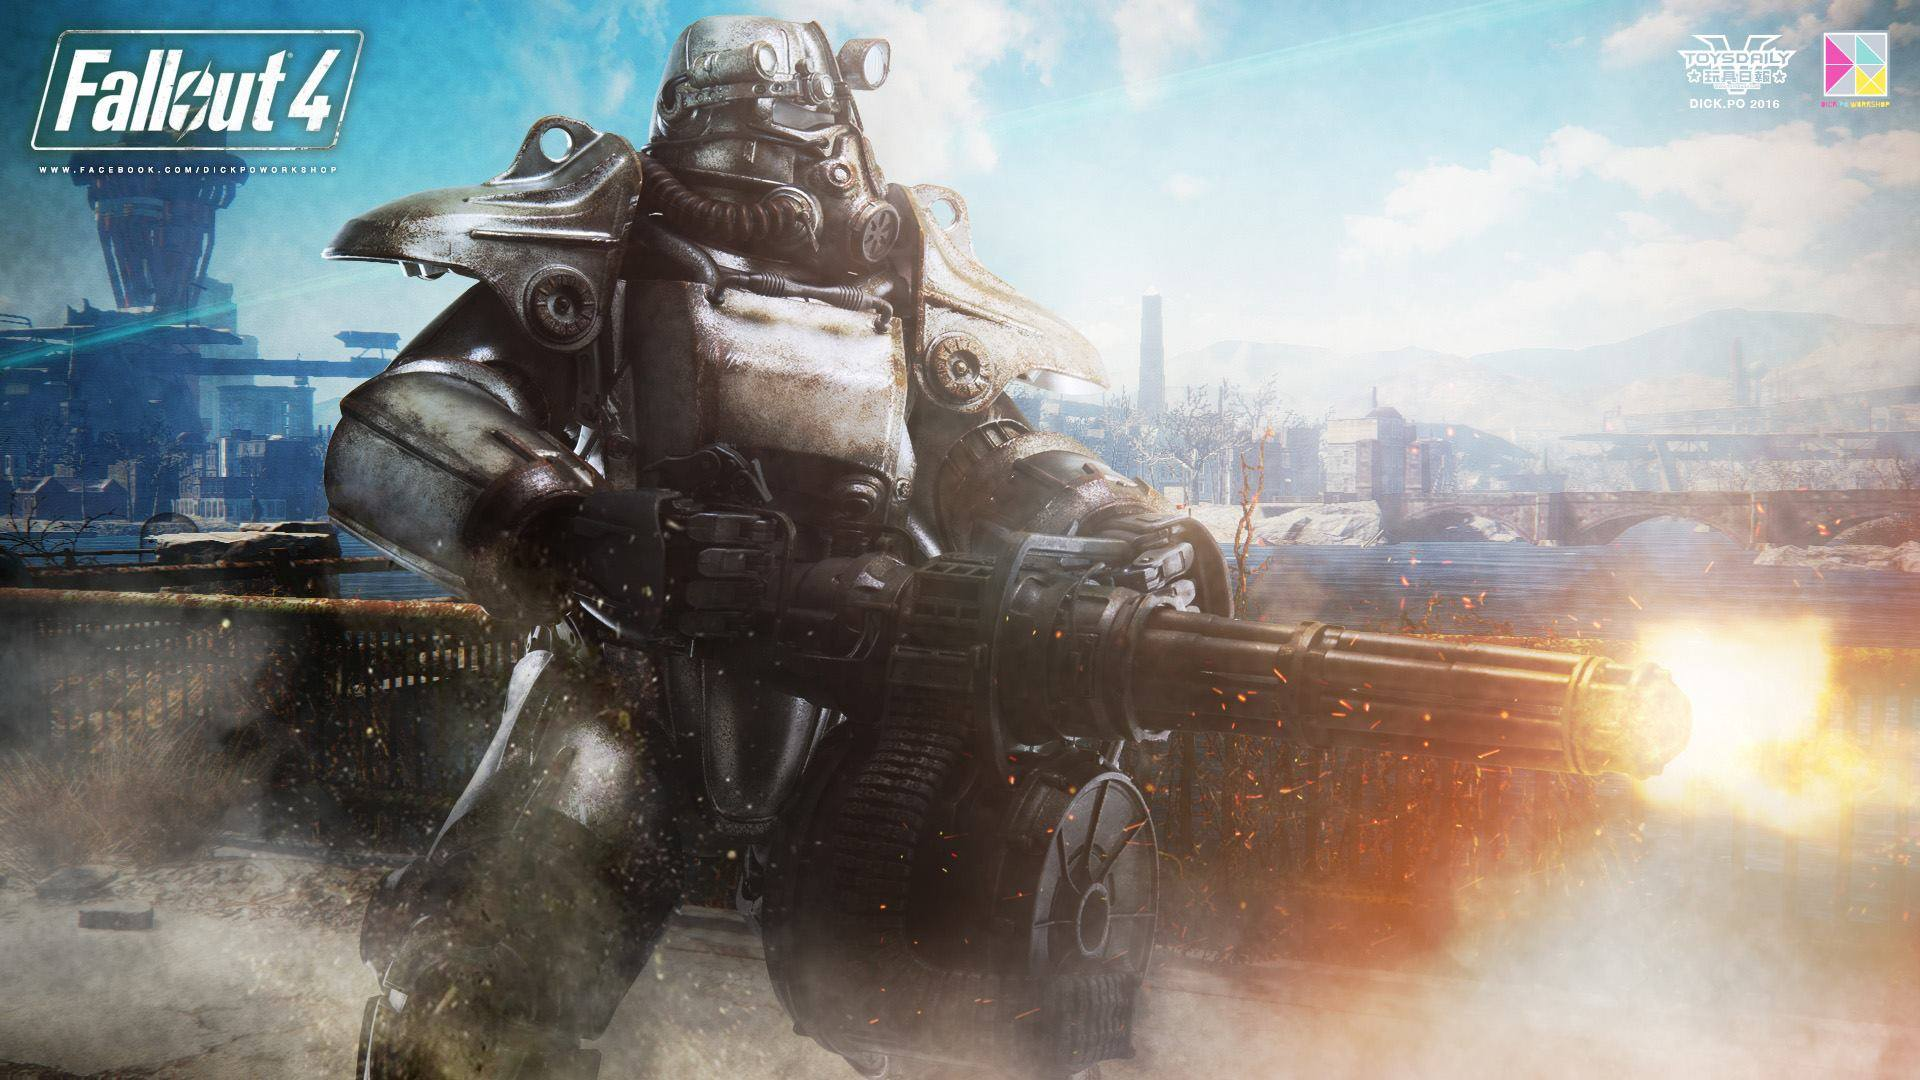 Fallout 4 Wallpaper Fallout Power Armor T 45 Art 2249949 Hd